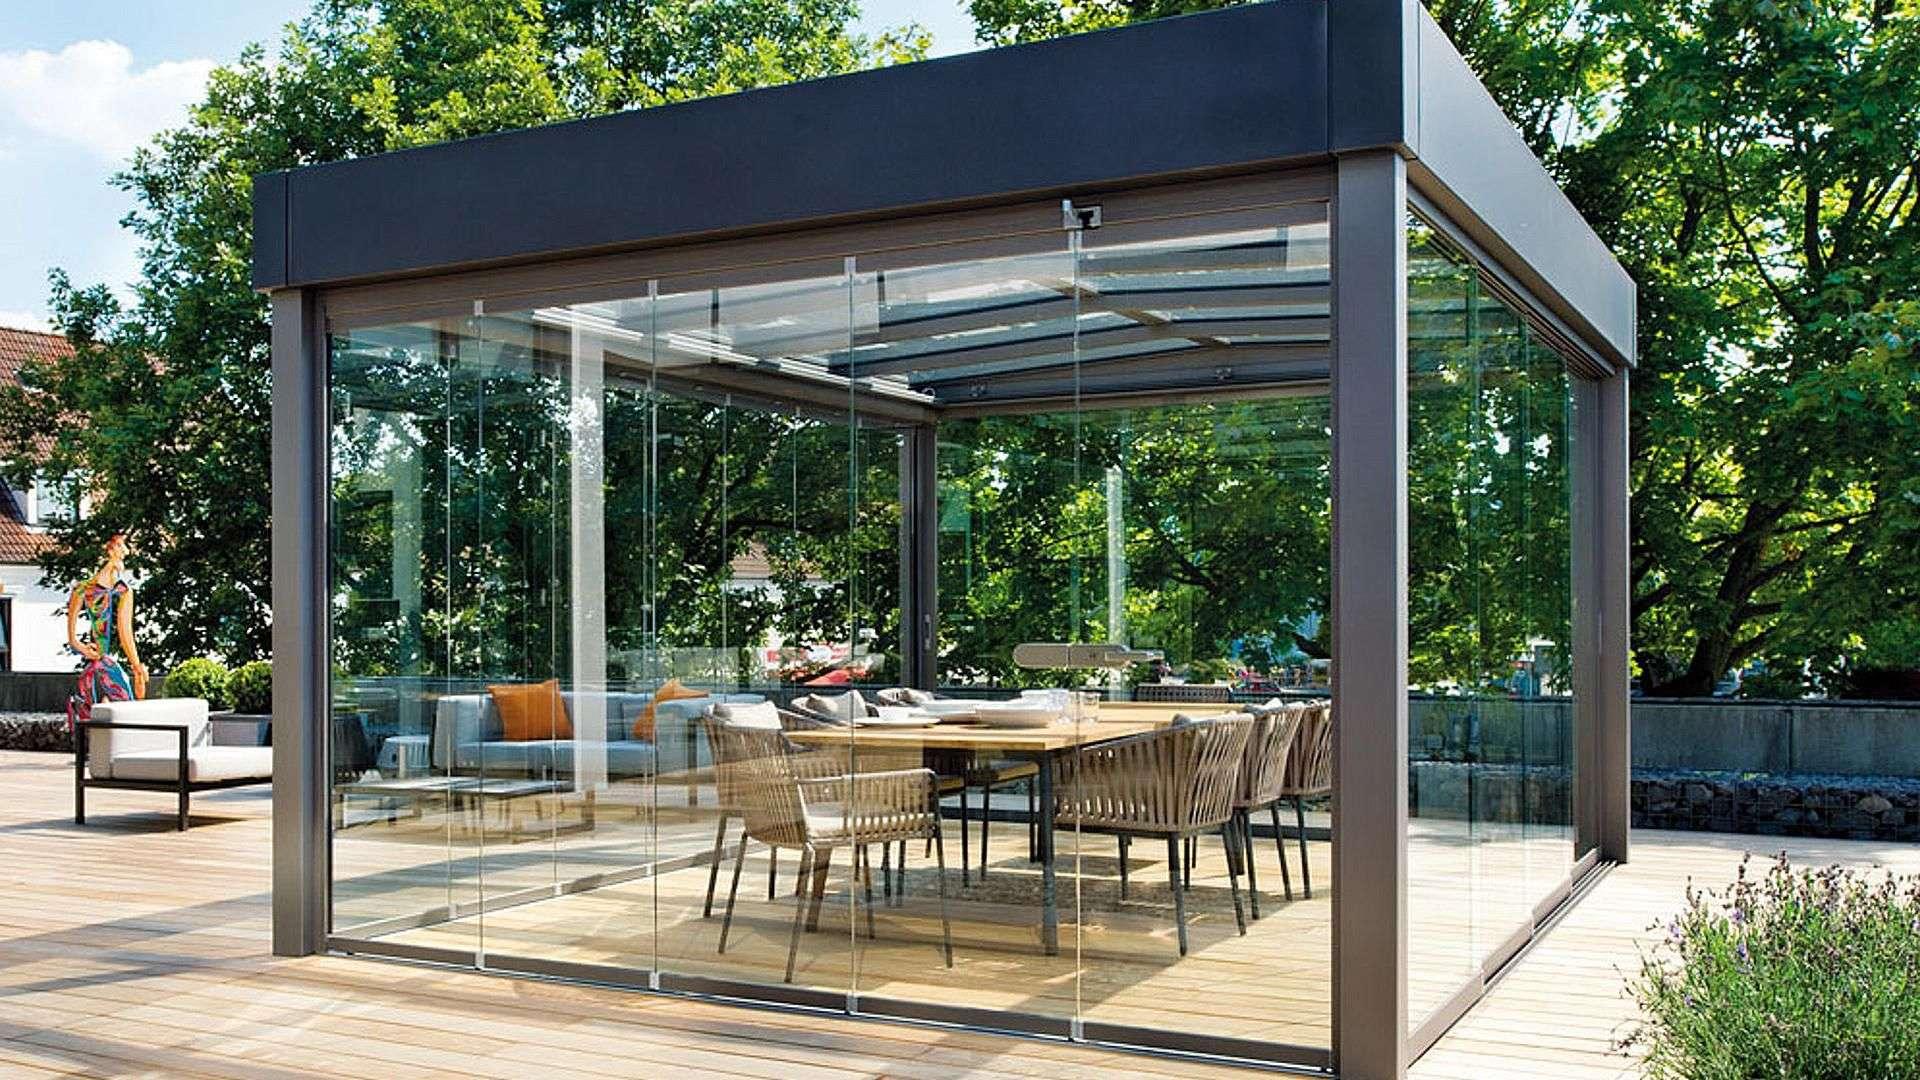 Wohnfuehlen - Das Glashaus Atrium Carre